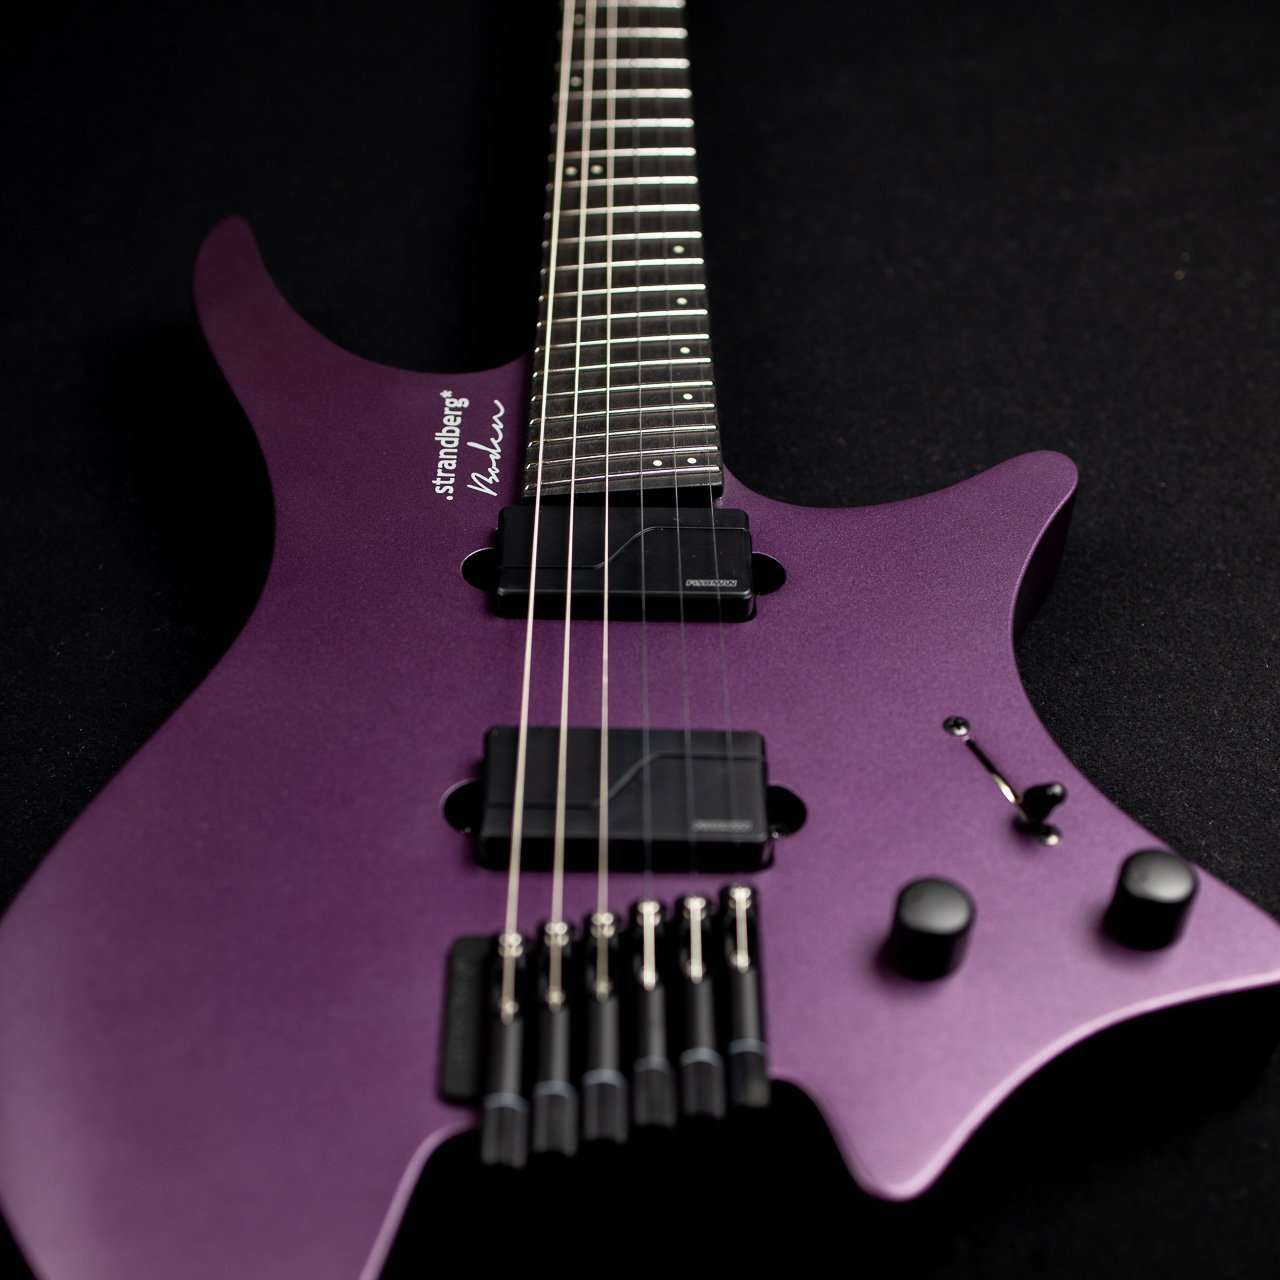 Headless Guitar Boden Metal purple front view